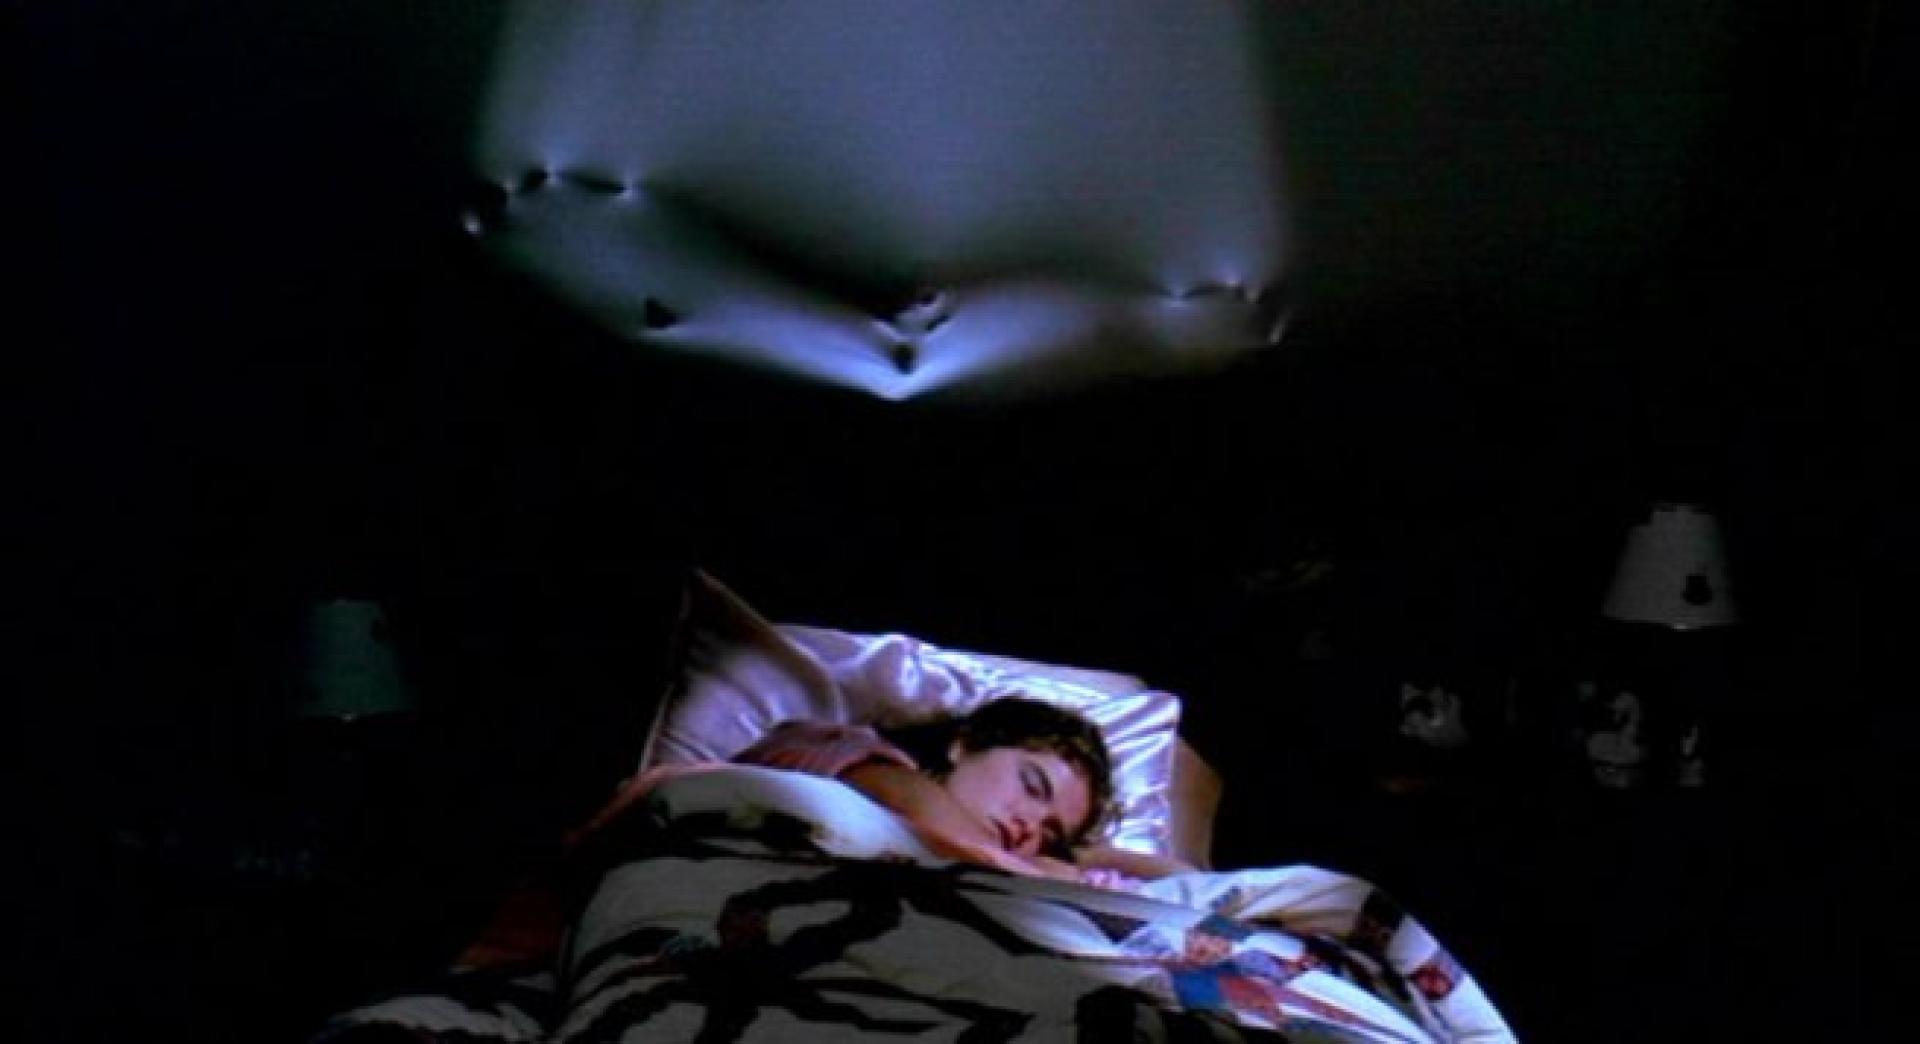 Nightmare on Elm Street - Rémálom az Elm utcában (1984)